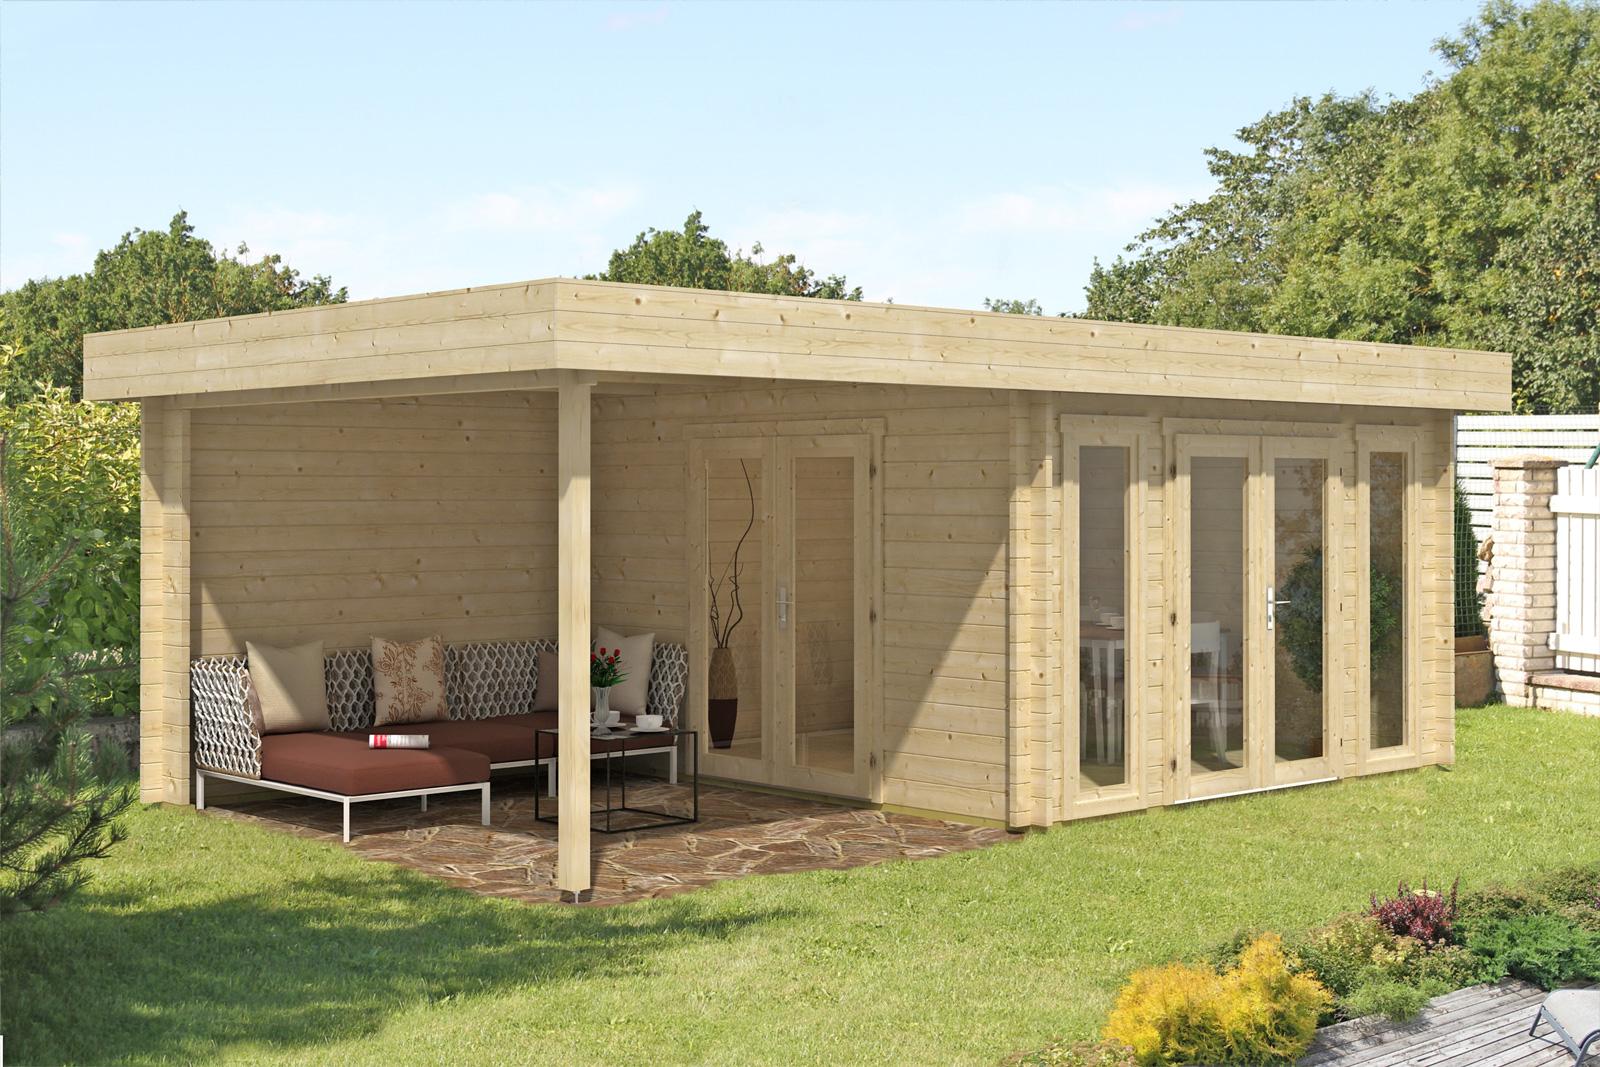 flachdach gartenhaus modell corsica 44 iso corsica 44 iso. Black Bedroom Furniture Sets. Home Design Ideas